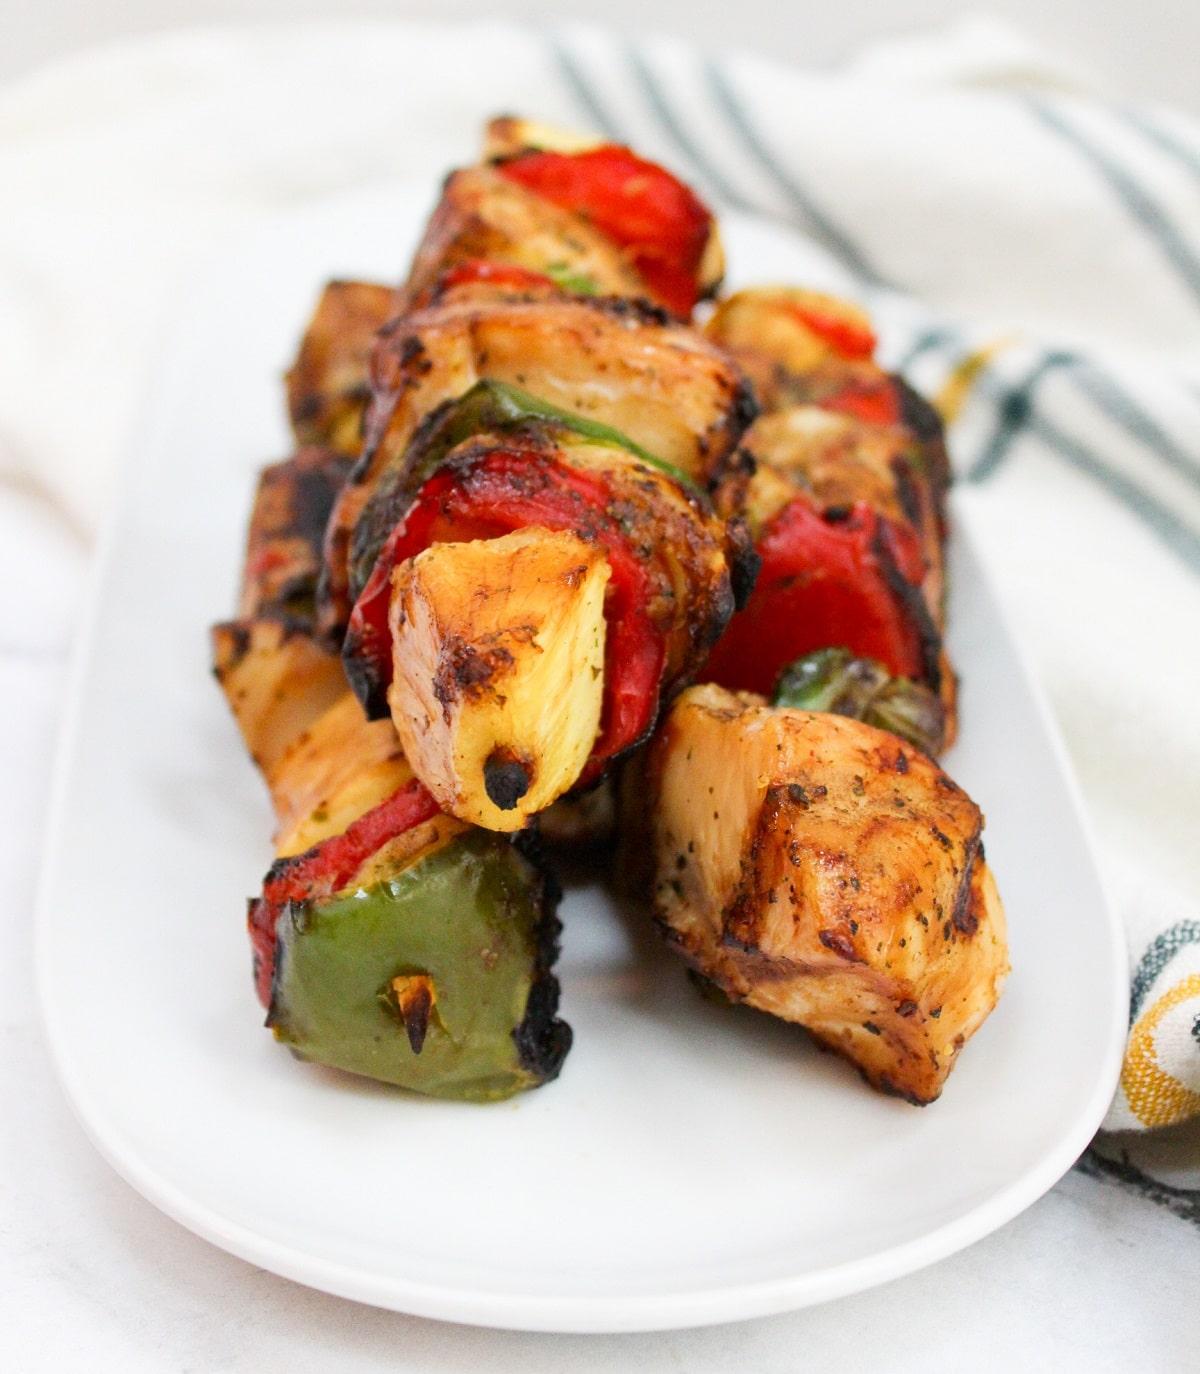 grilled teriyaki chicken kabob